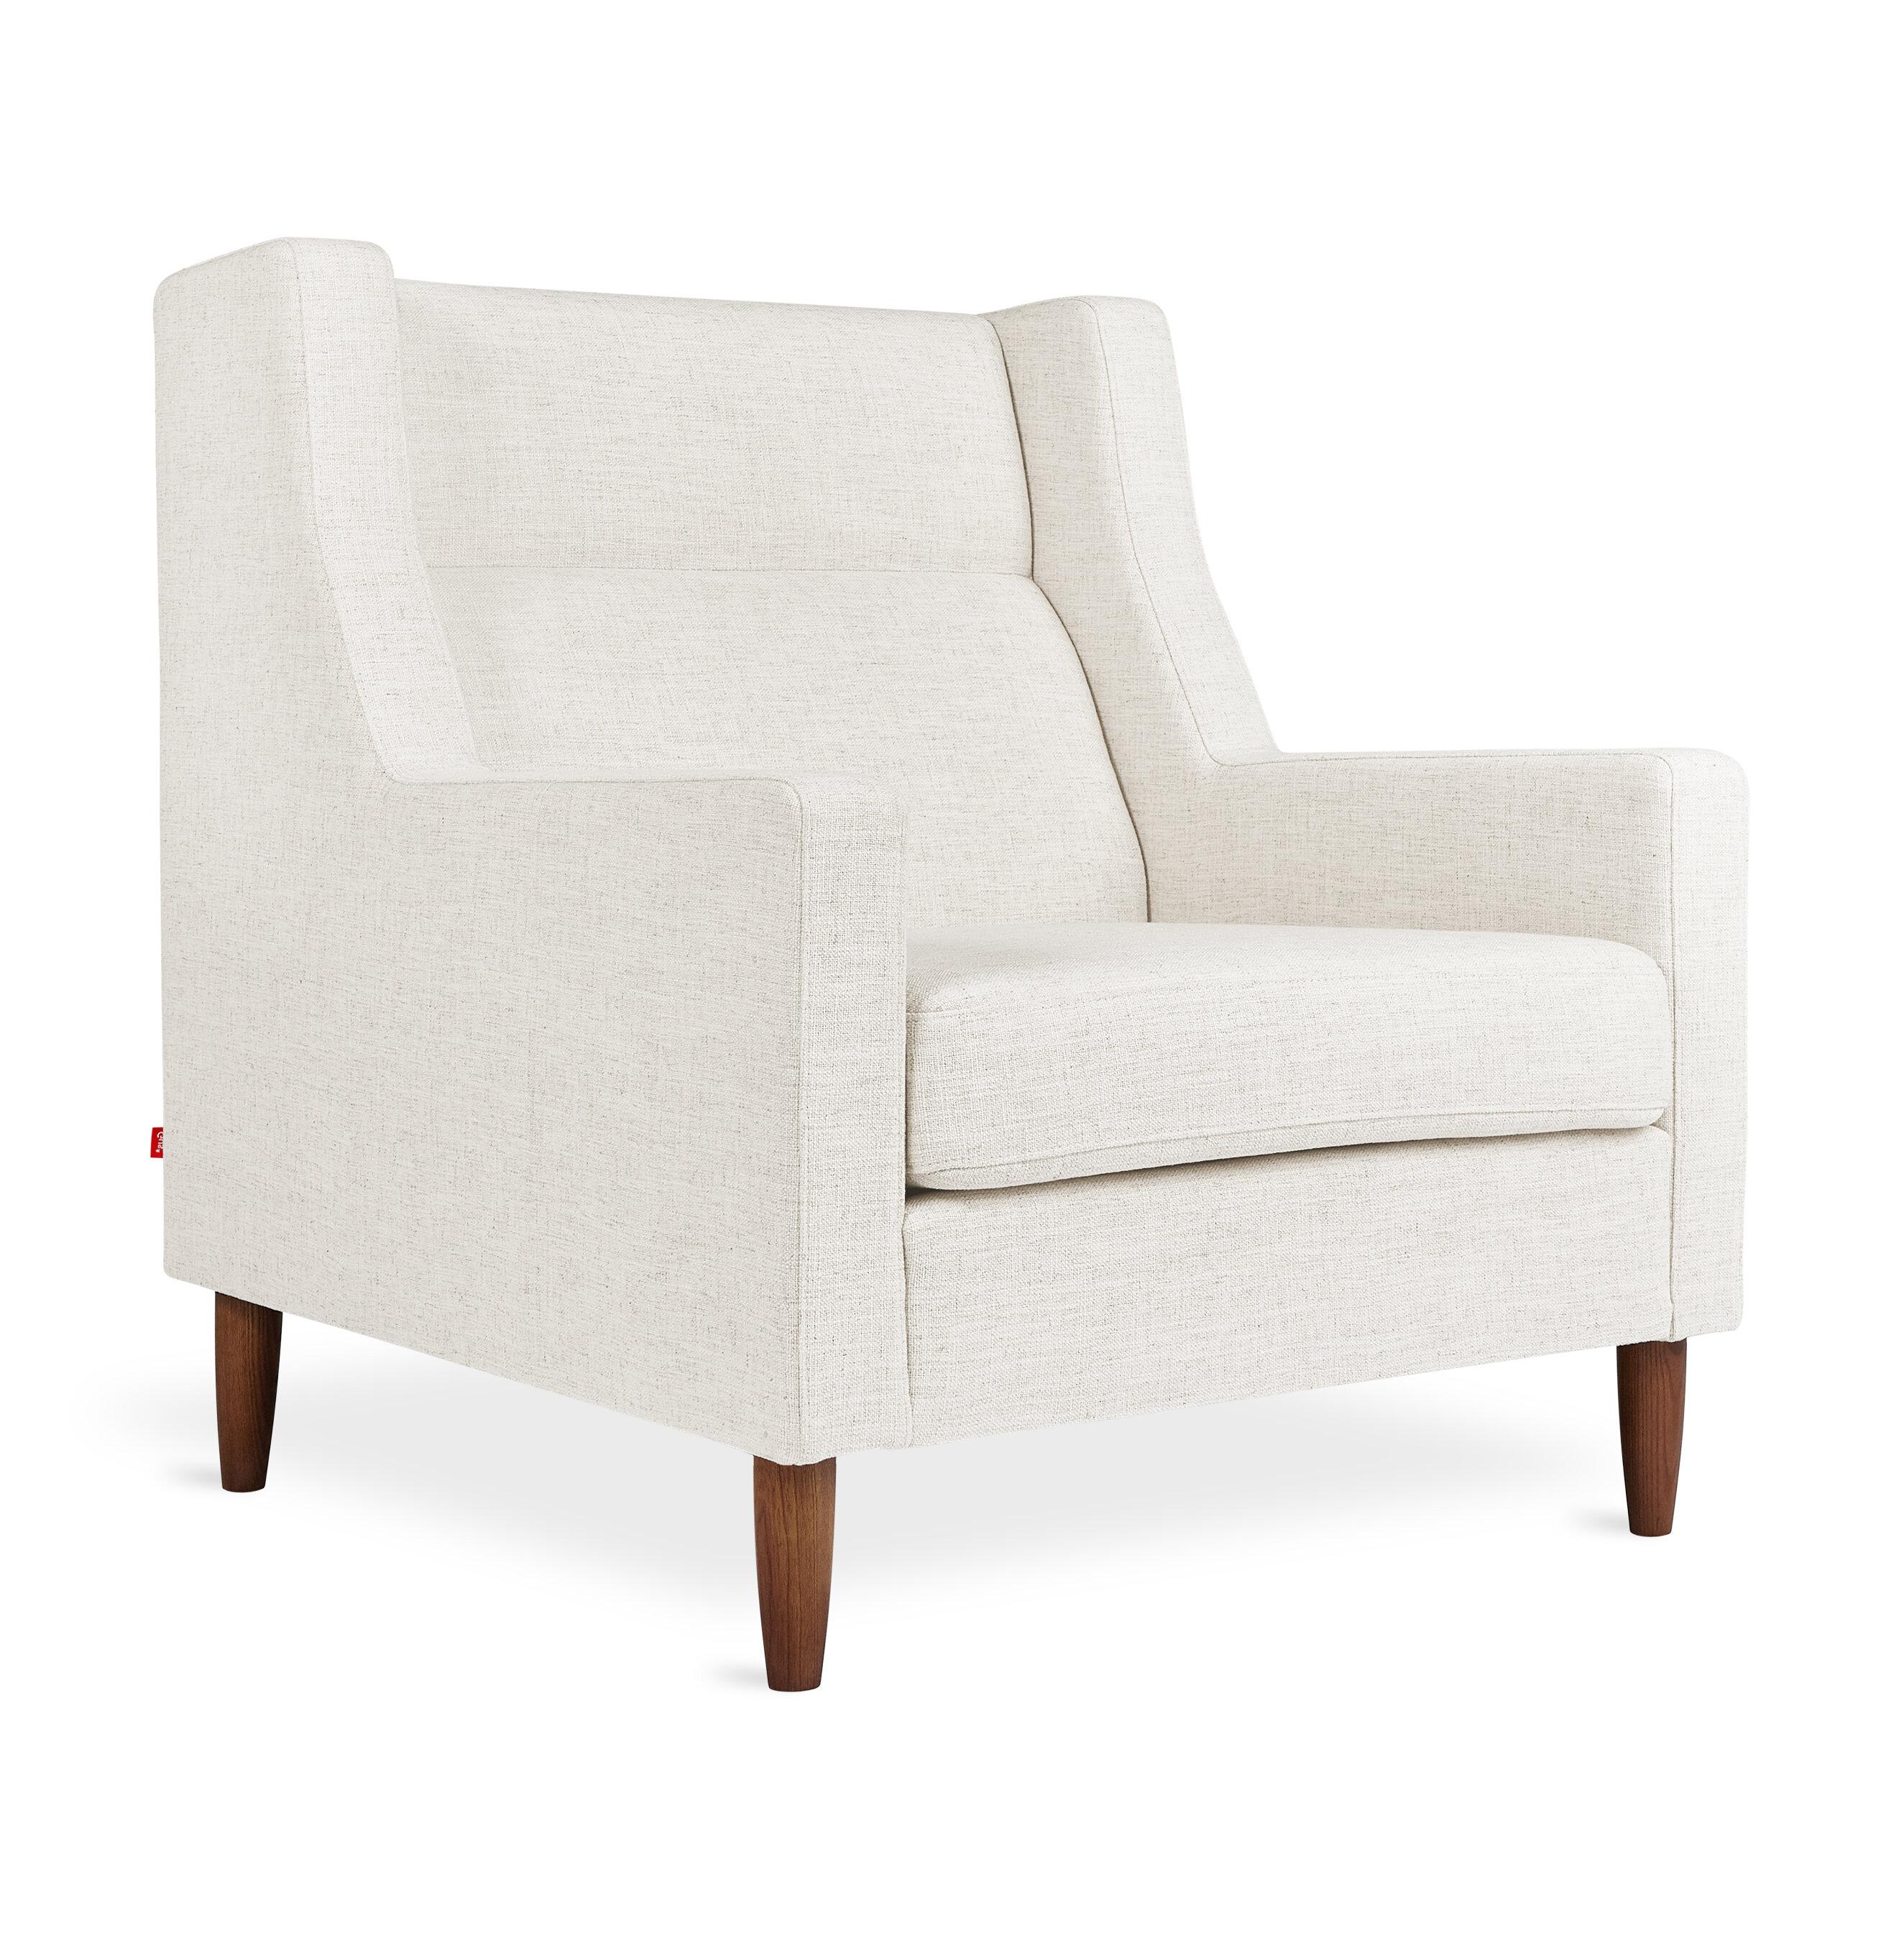 Fabulous Carmichael Wingback Chair Pabps2019 Chair Design Images Pabps2019Com